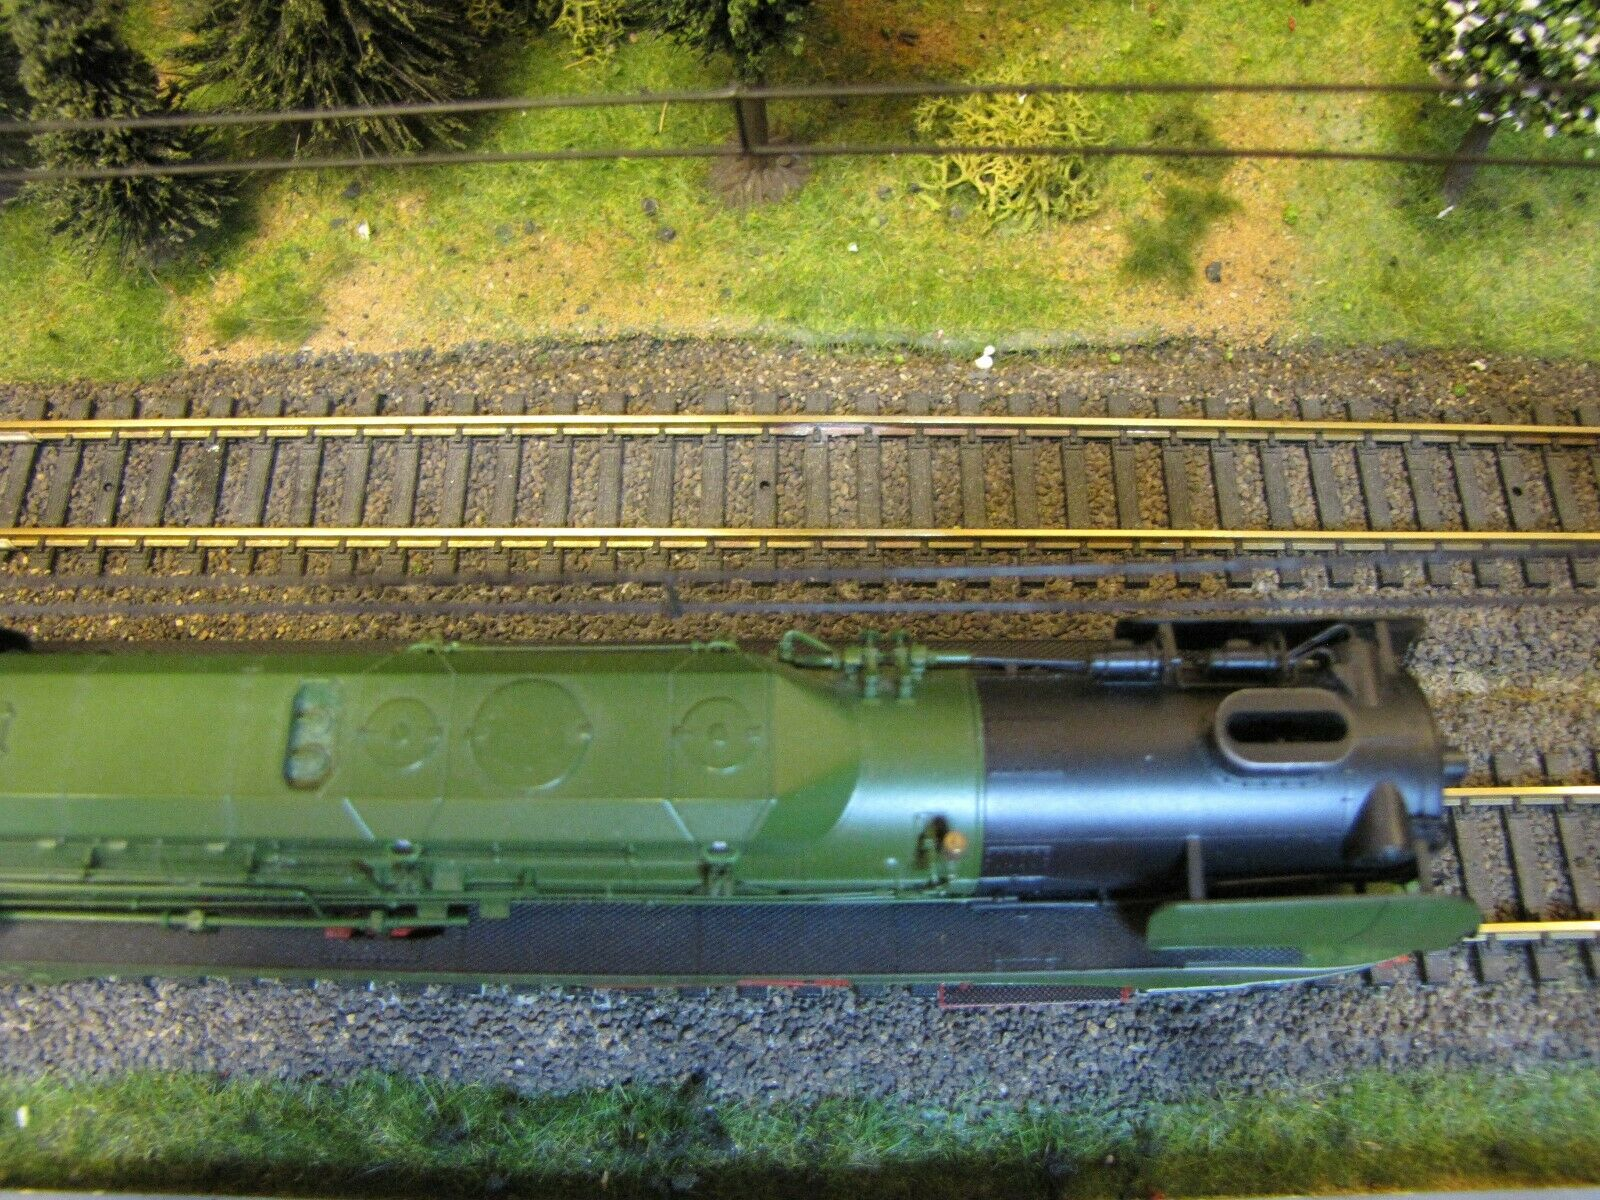 ROCO (63201) locomotiva 18 201 ho CC Digital Sound OVP